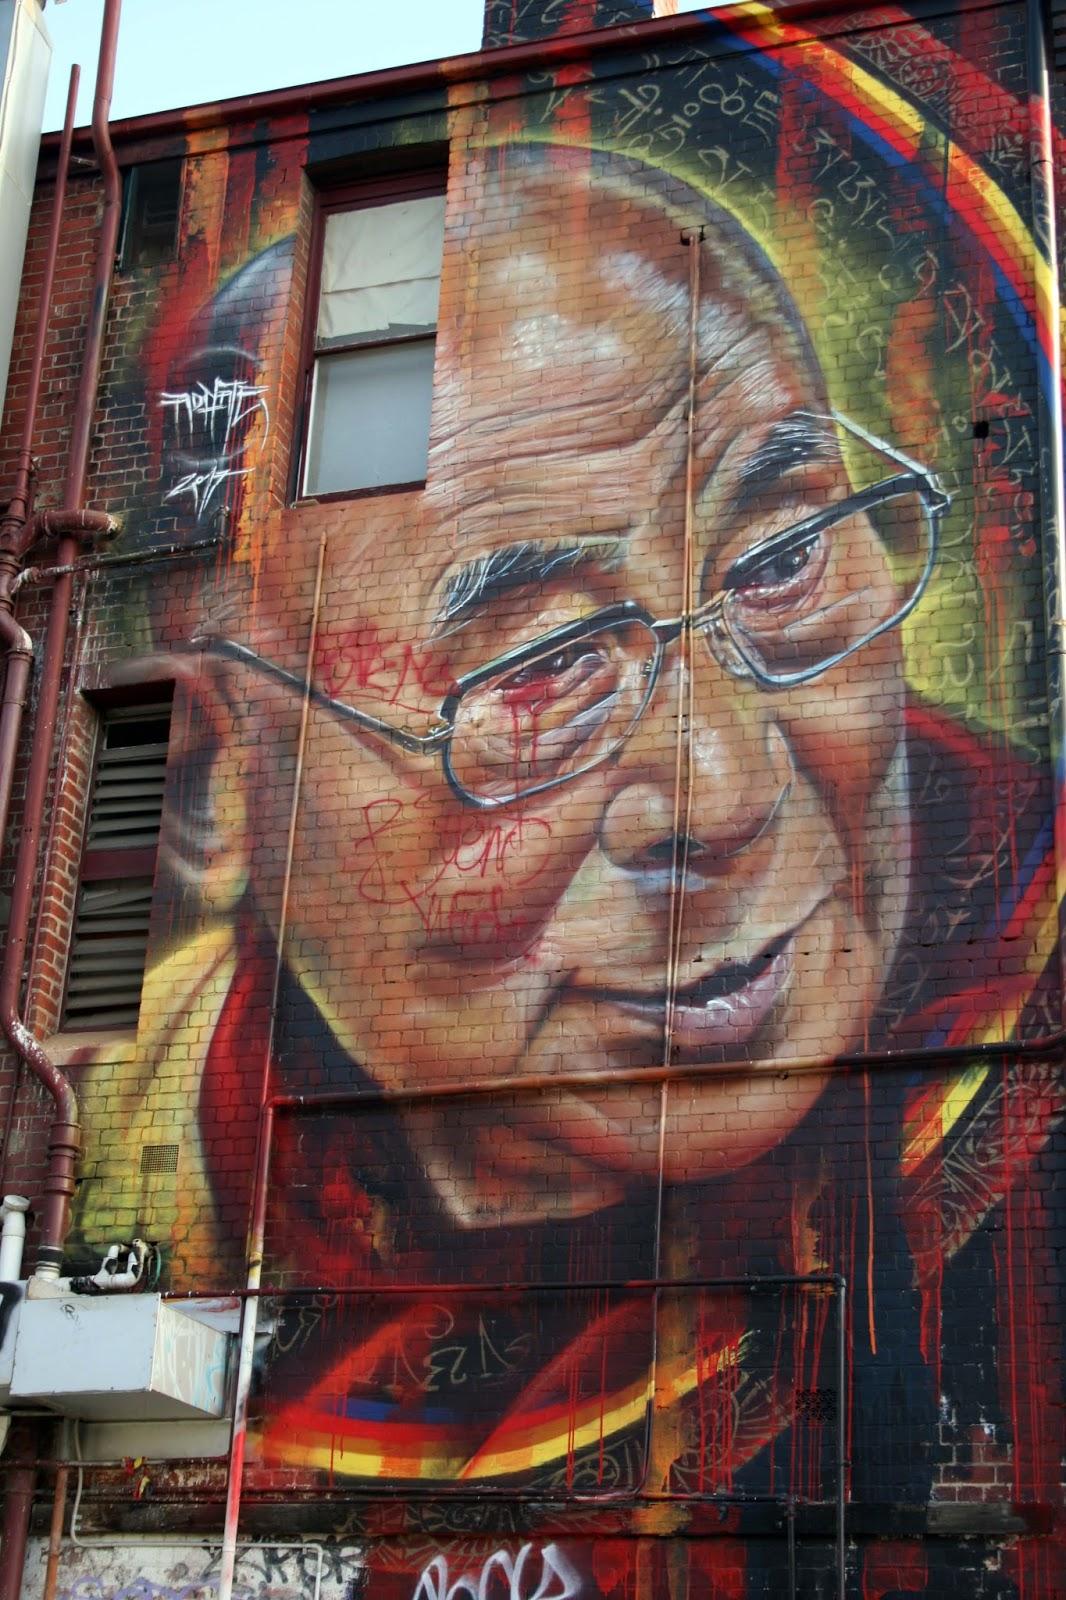 Street Art Melbourne 17 H Adnate Lush Meggs Ryot Heesco Putos Knock Choq Welin Smug Shida Phibs Heesco